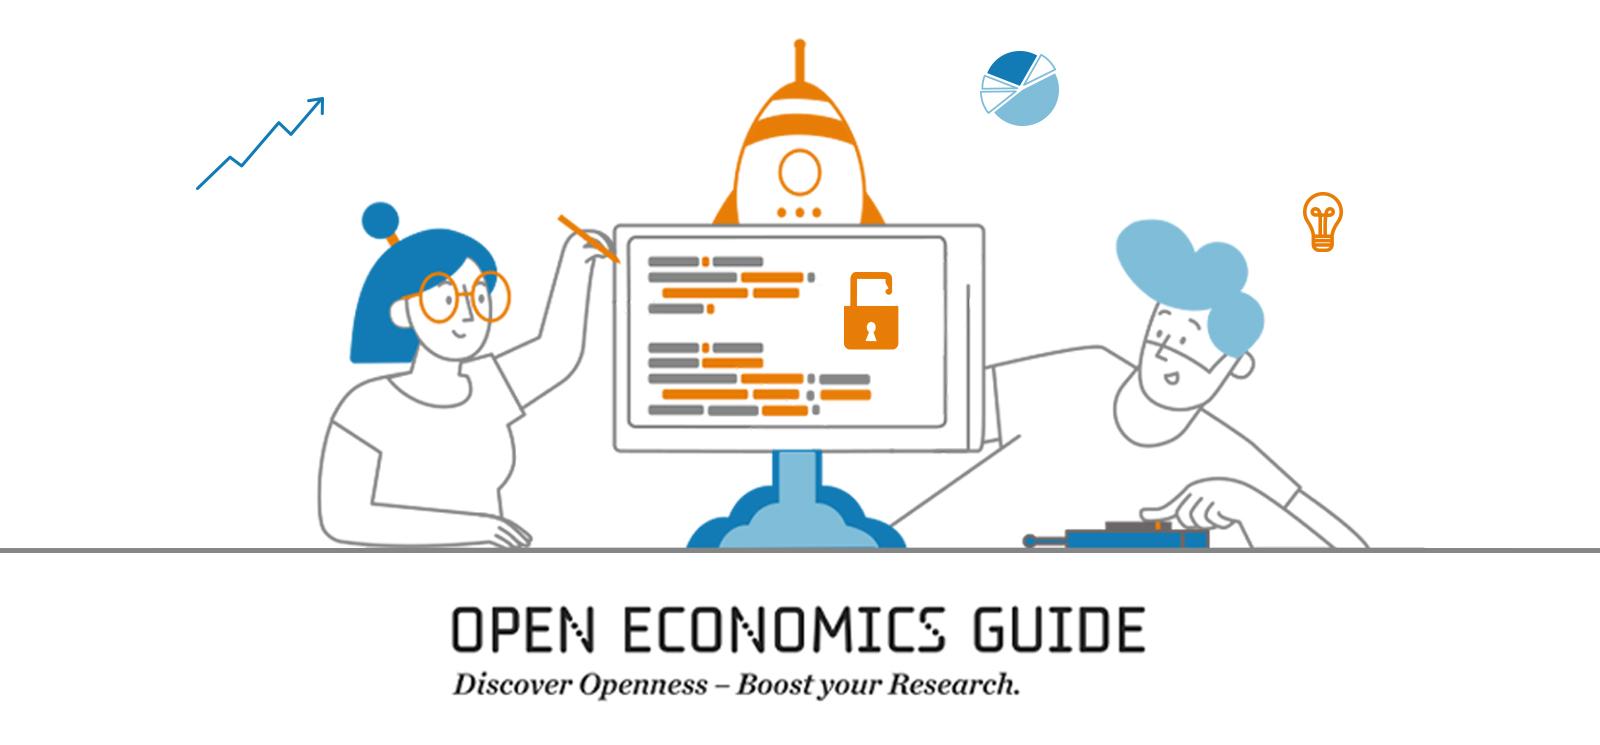 Illustration Open Economics Guide